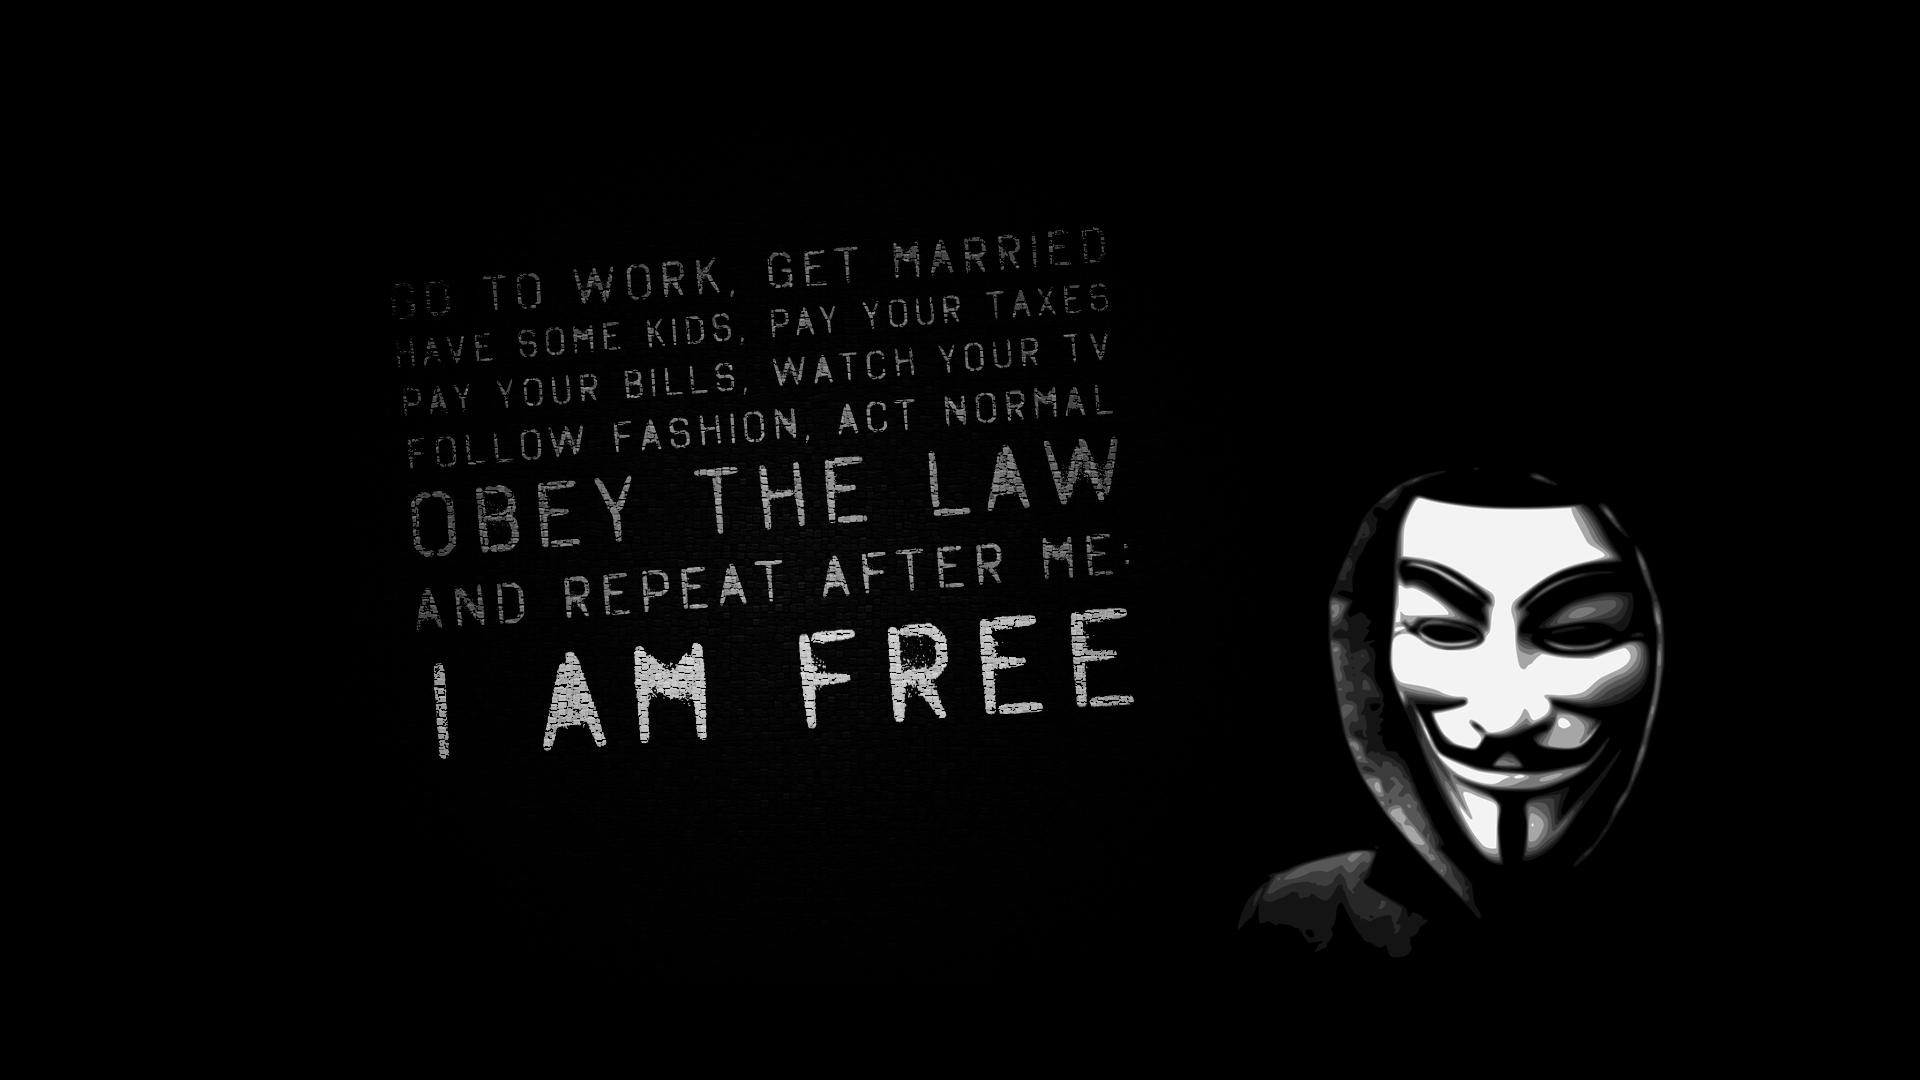 I Am Free Wallpaper Freedom Wallpaper HD -...